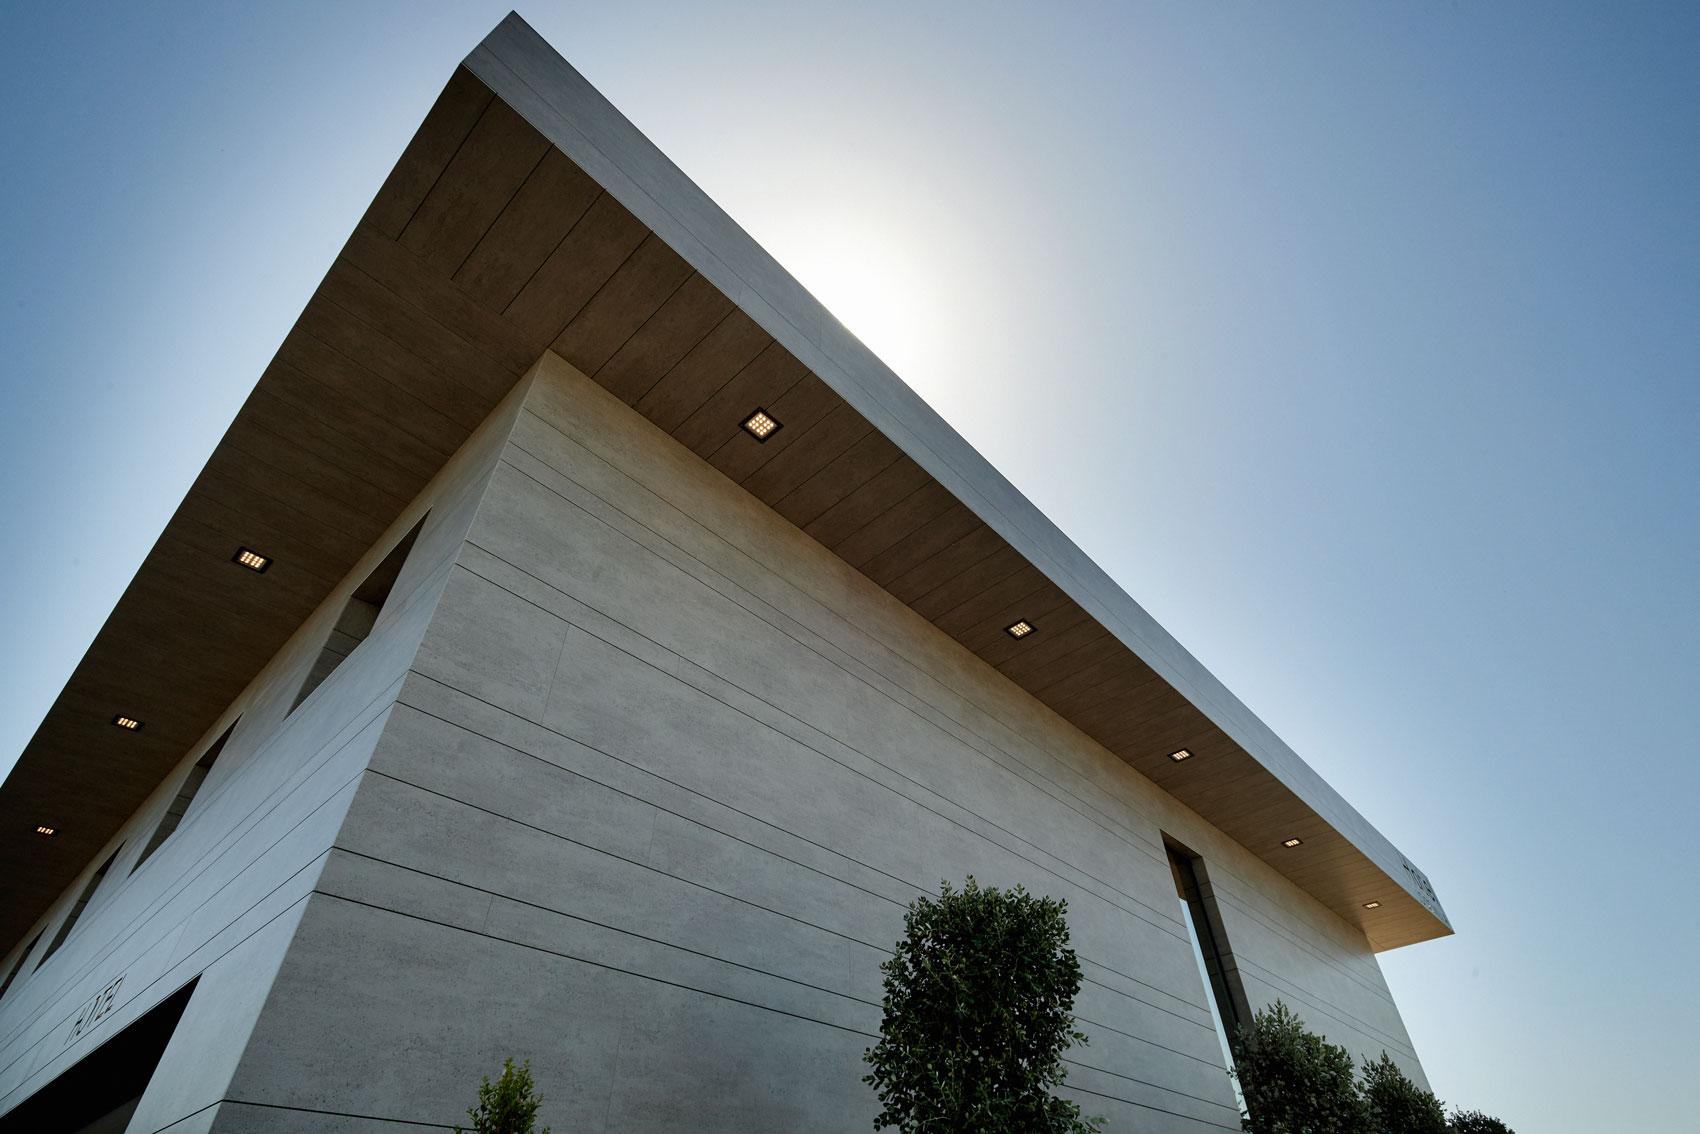 Fachadas que se adaptam  - cosentino 161 fachada principal DSC 0004 43